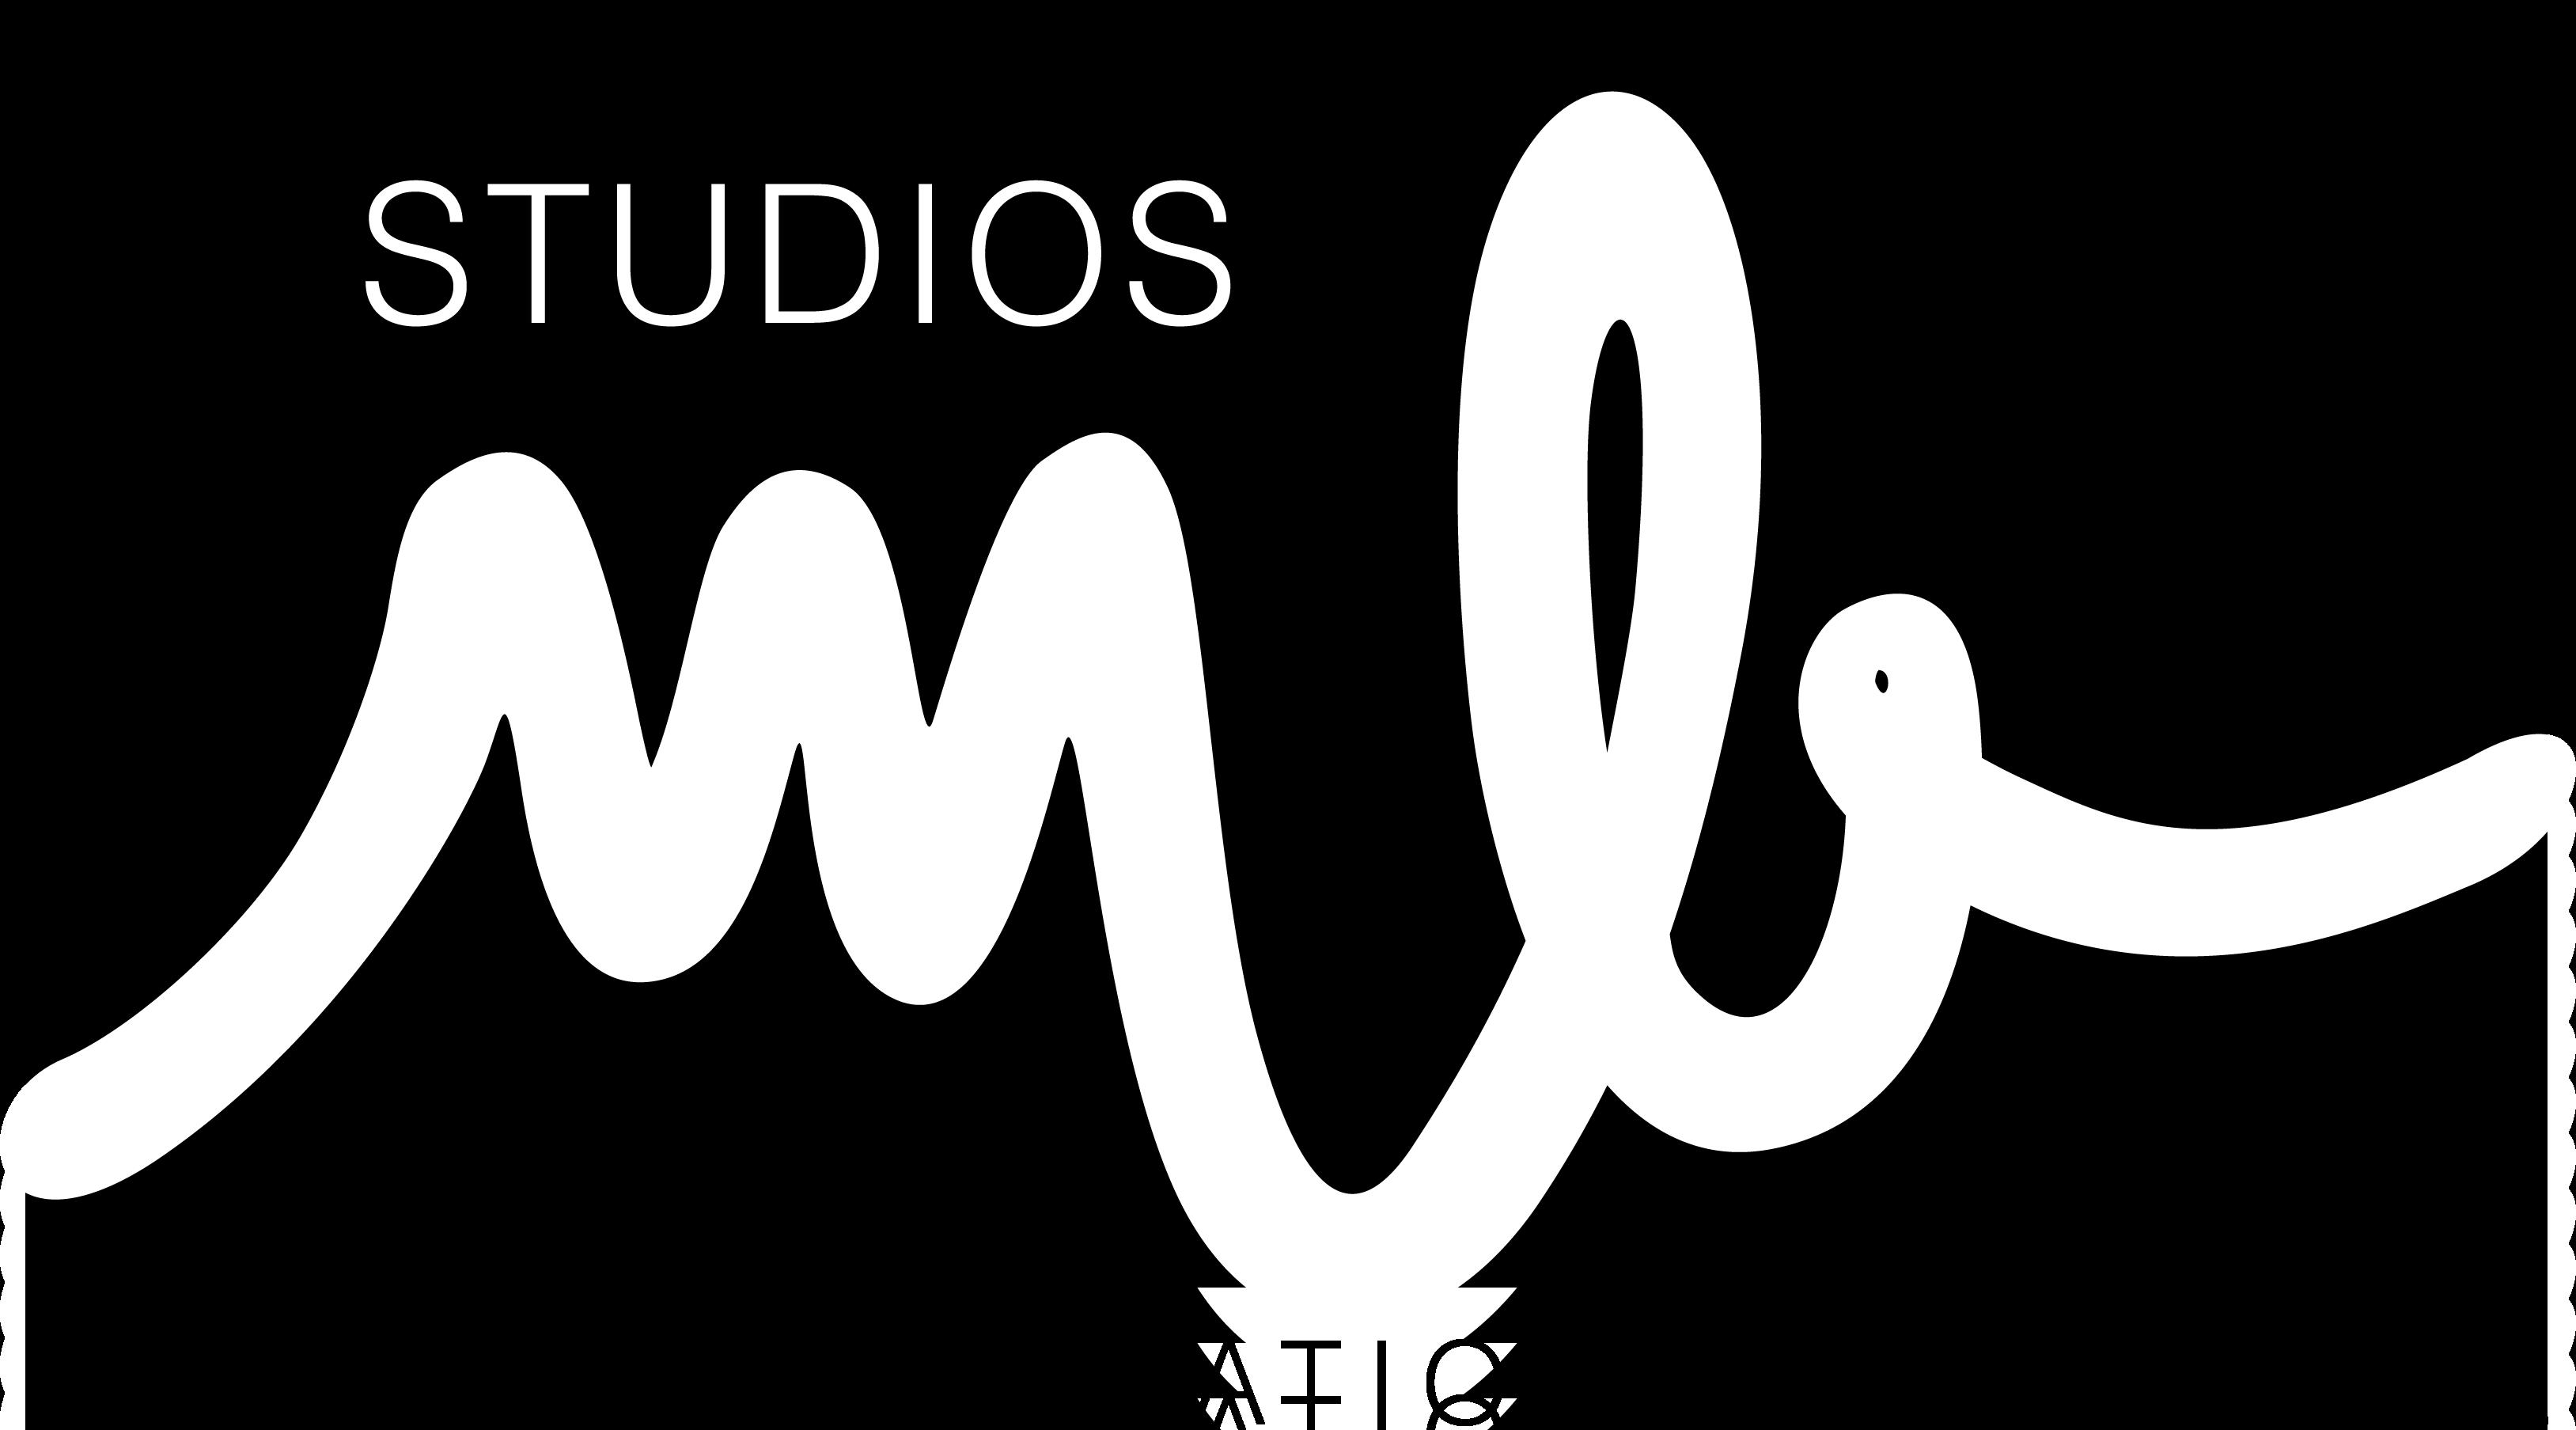 Studios Manuel Barreiro